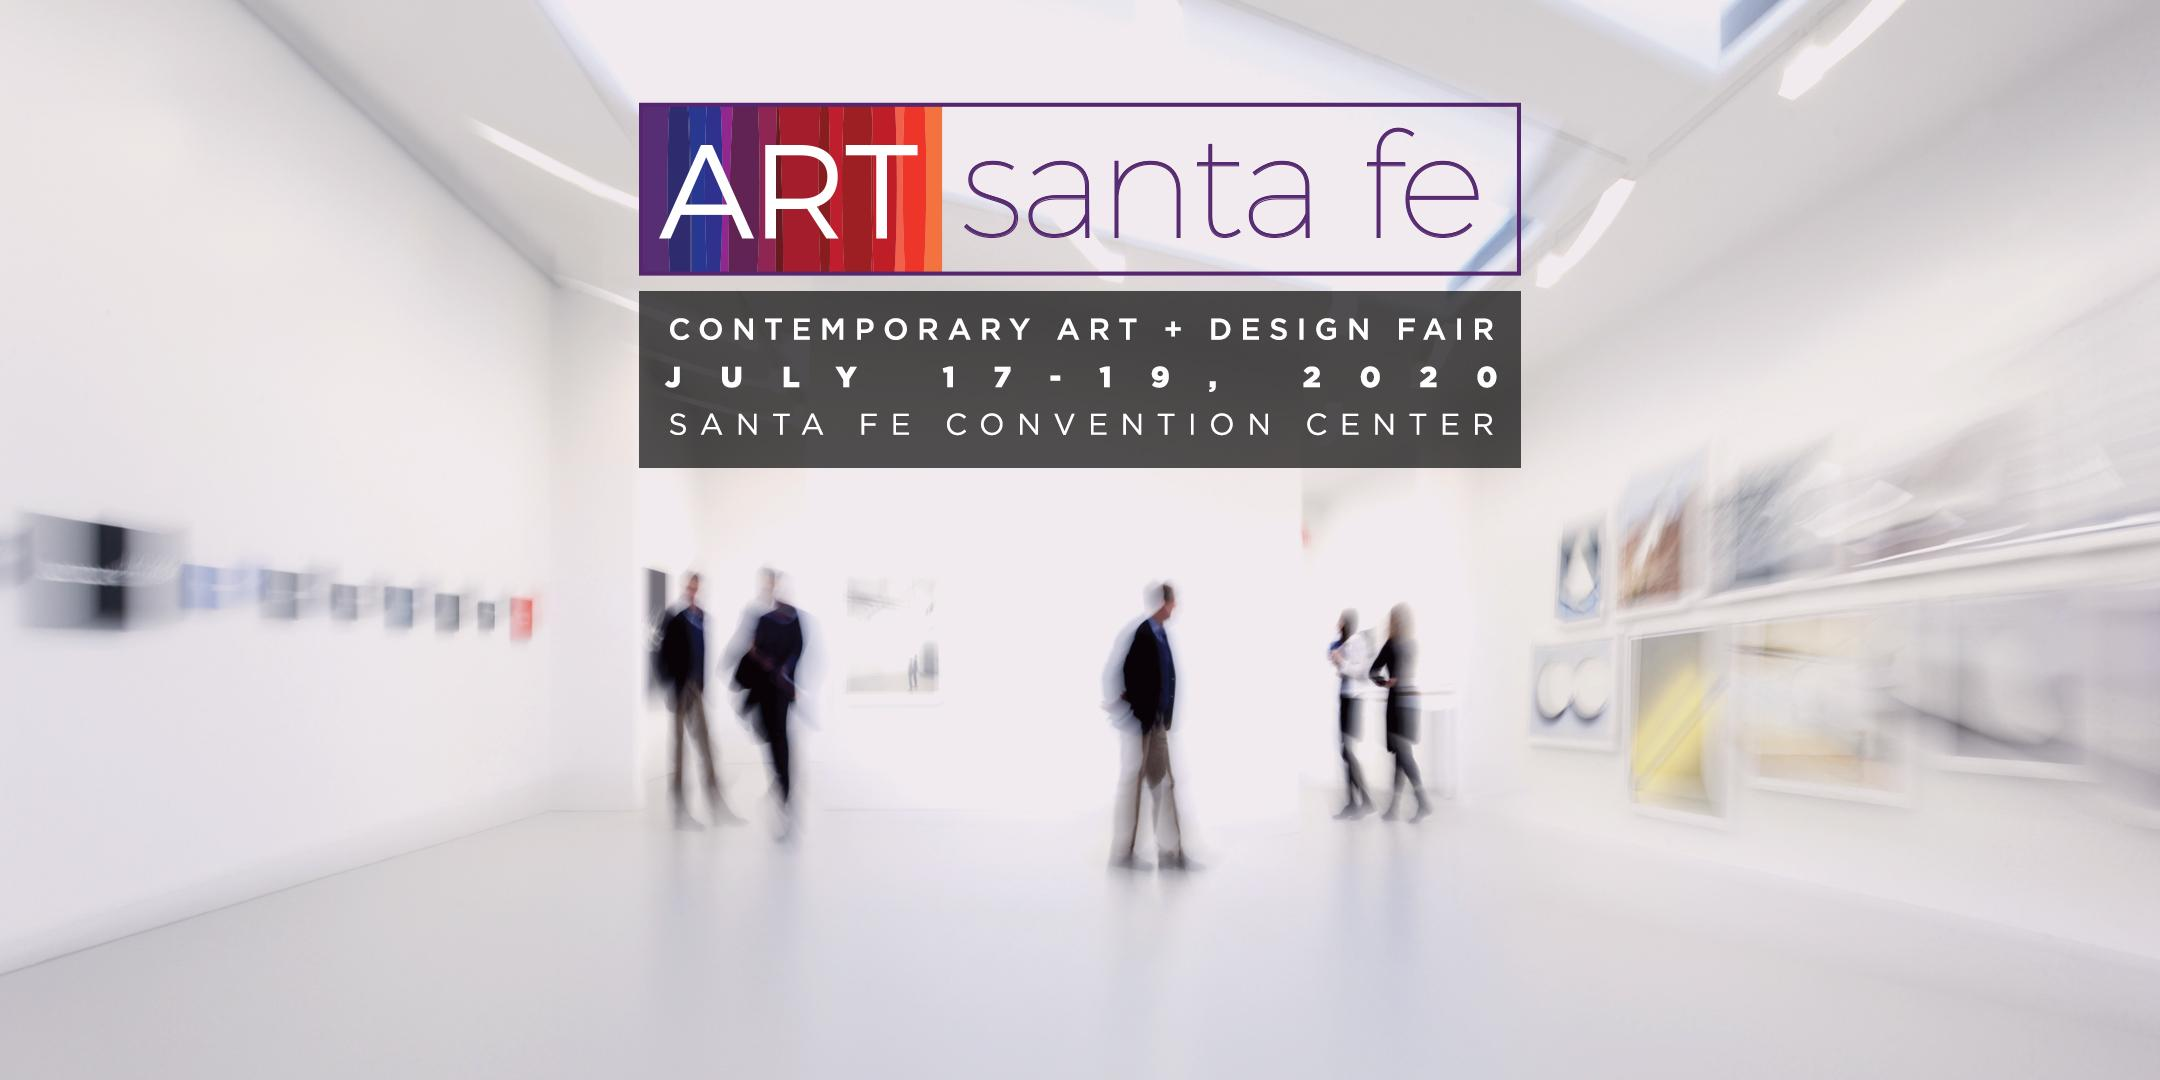 Art Santa Fe Contemporary Art Fair   July 17-19, 2020